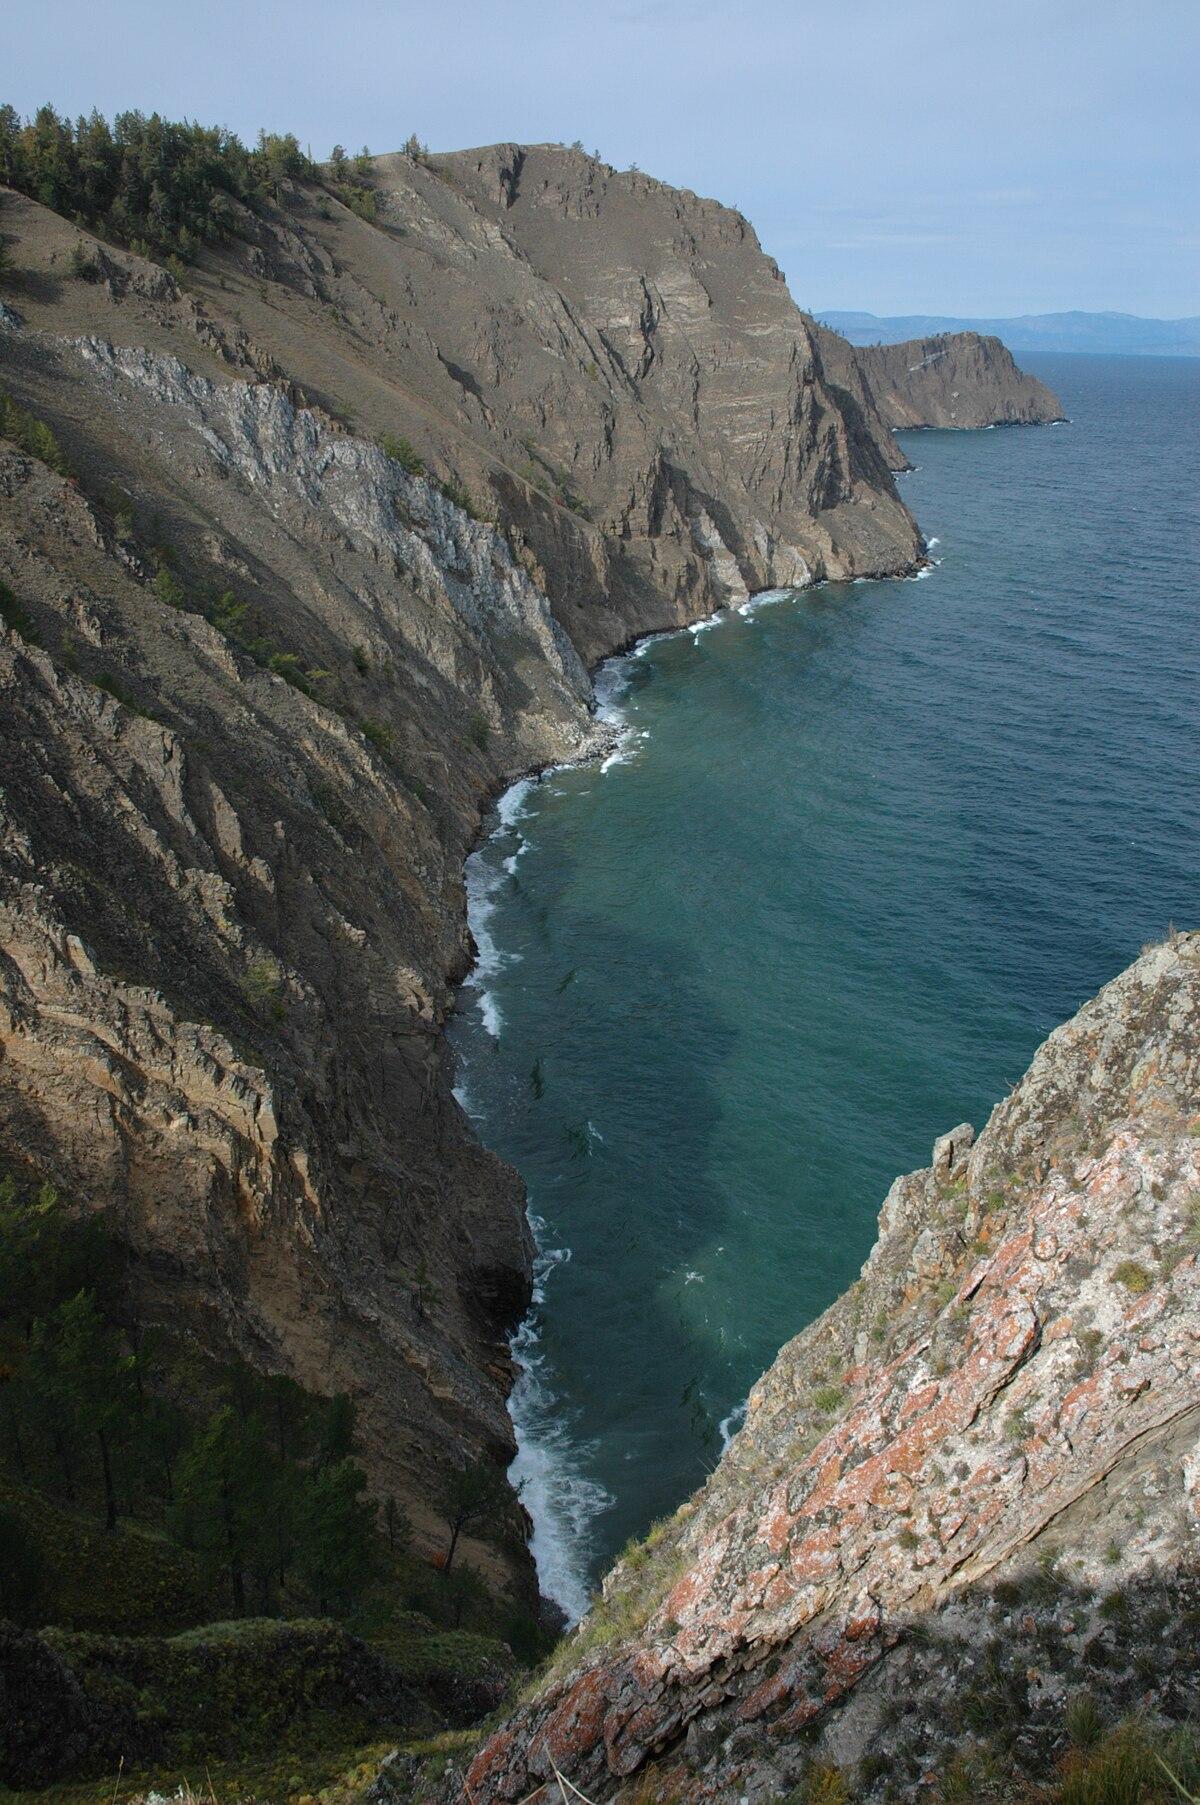 Lake Baikal - Wikipedia - 416.3KB